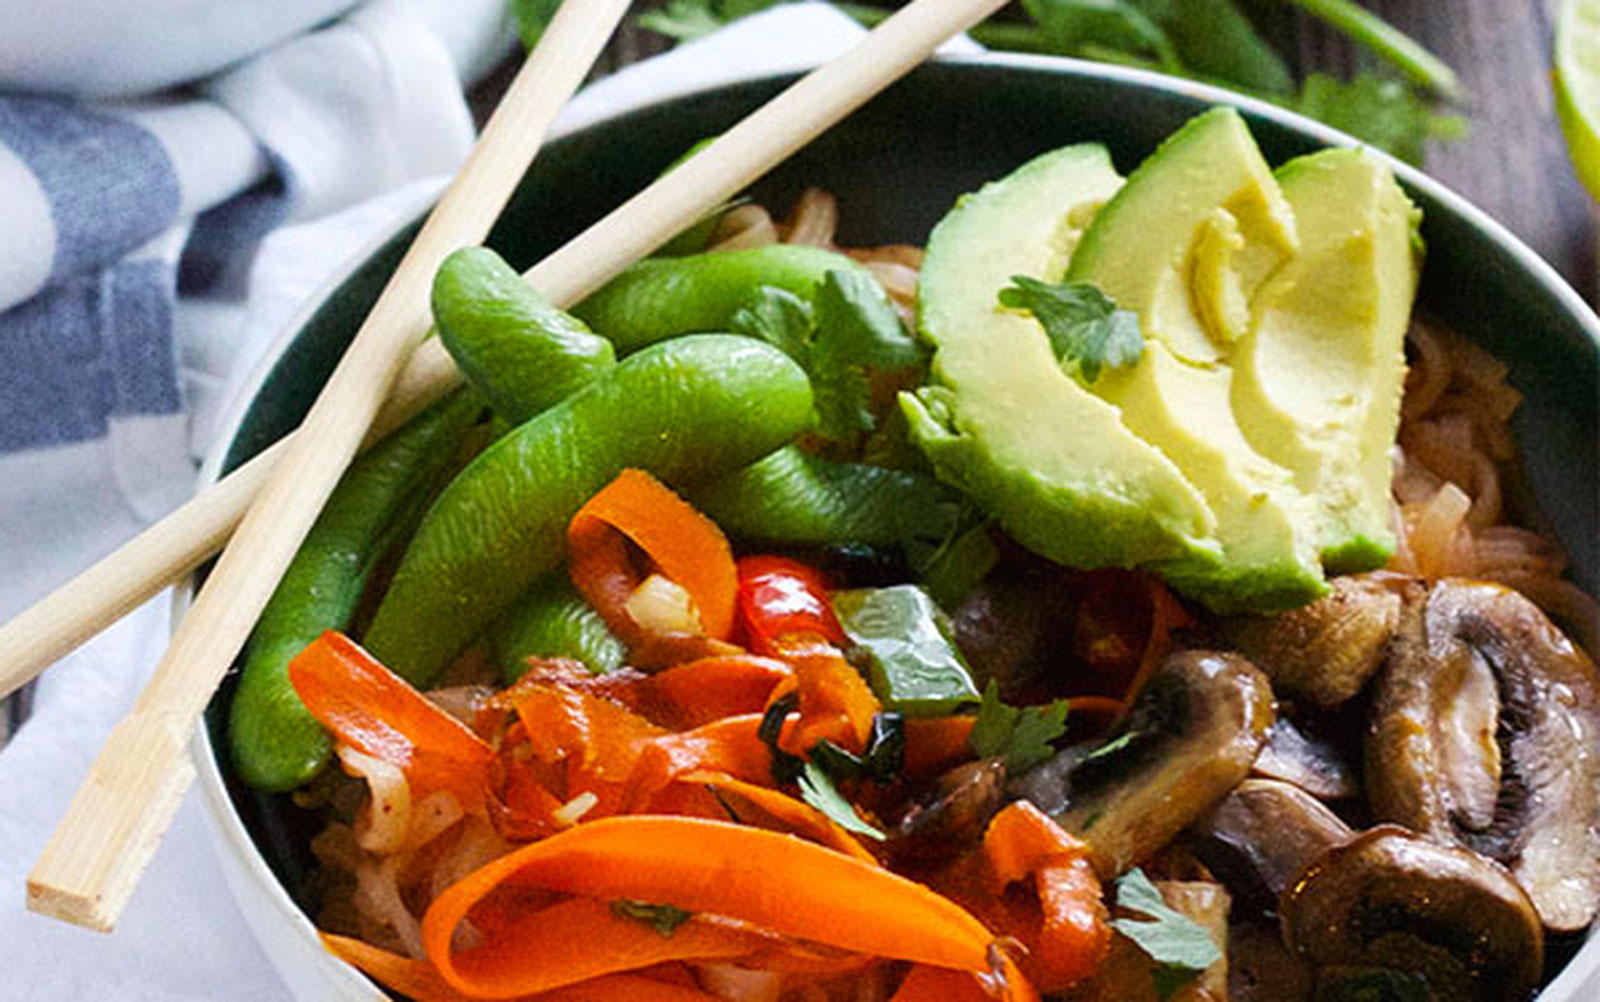 Chili Lime Thai Noodle Bowl [Vegan, Gluten-Free]